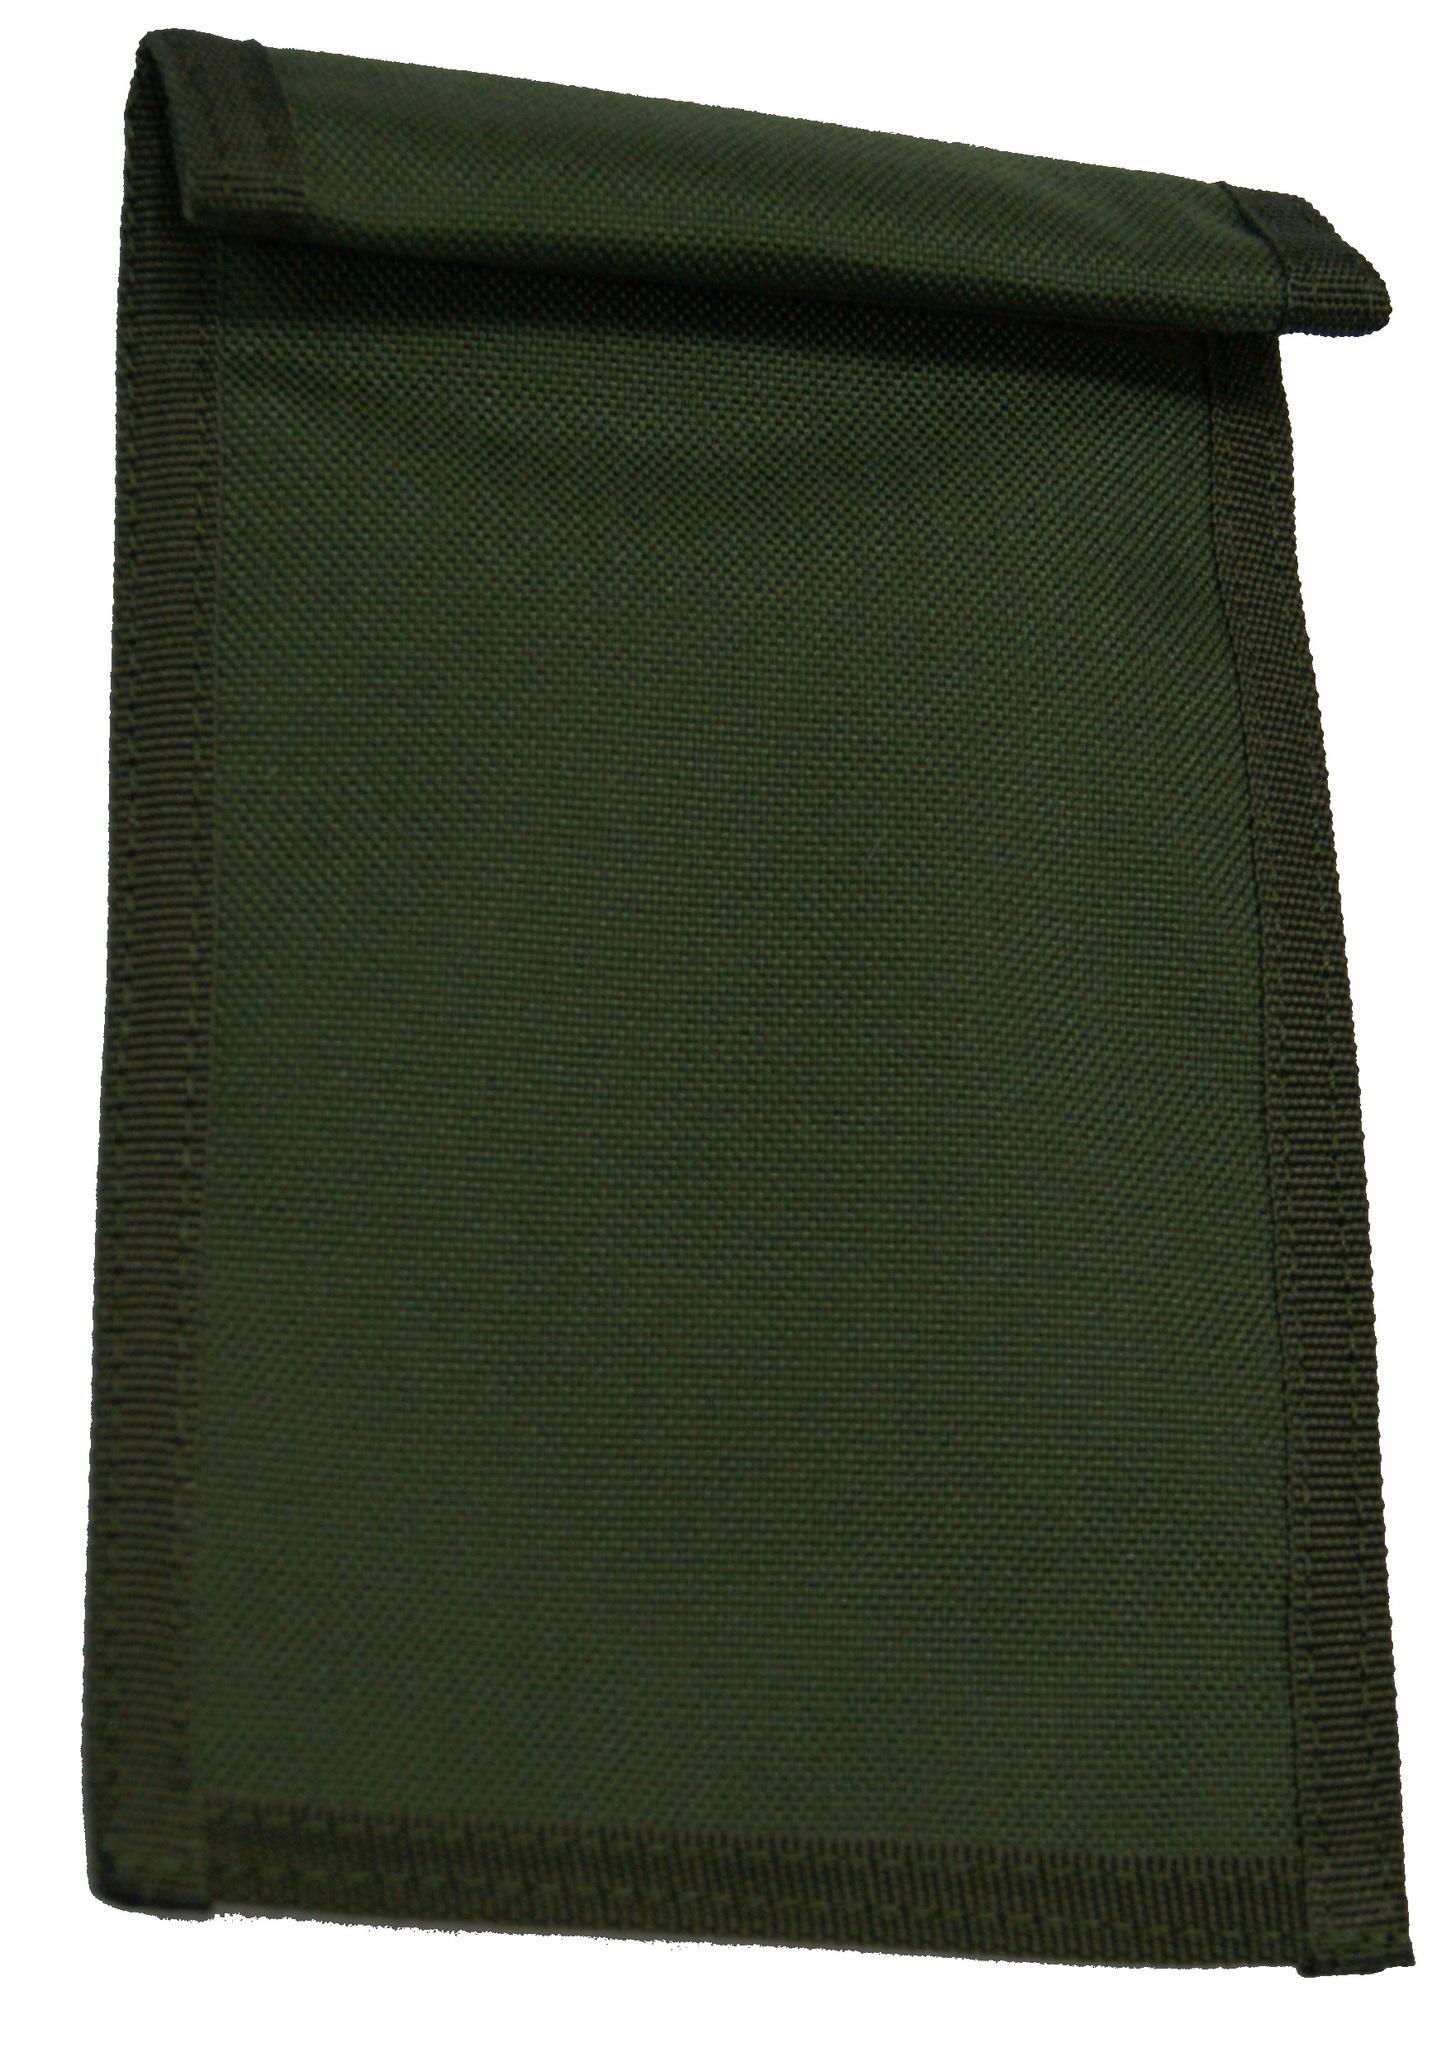 Чехол для телефона RadioBlock Case AVP, 30х50 см